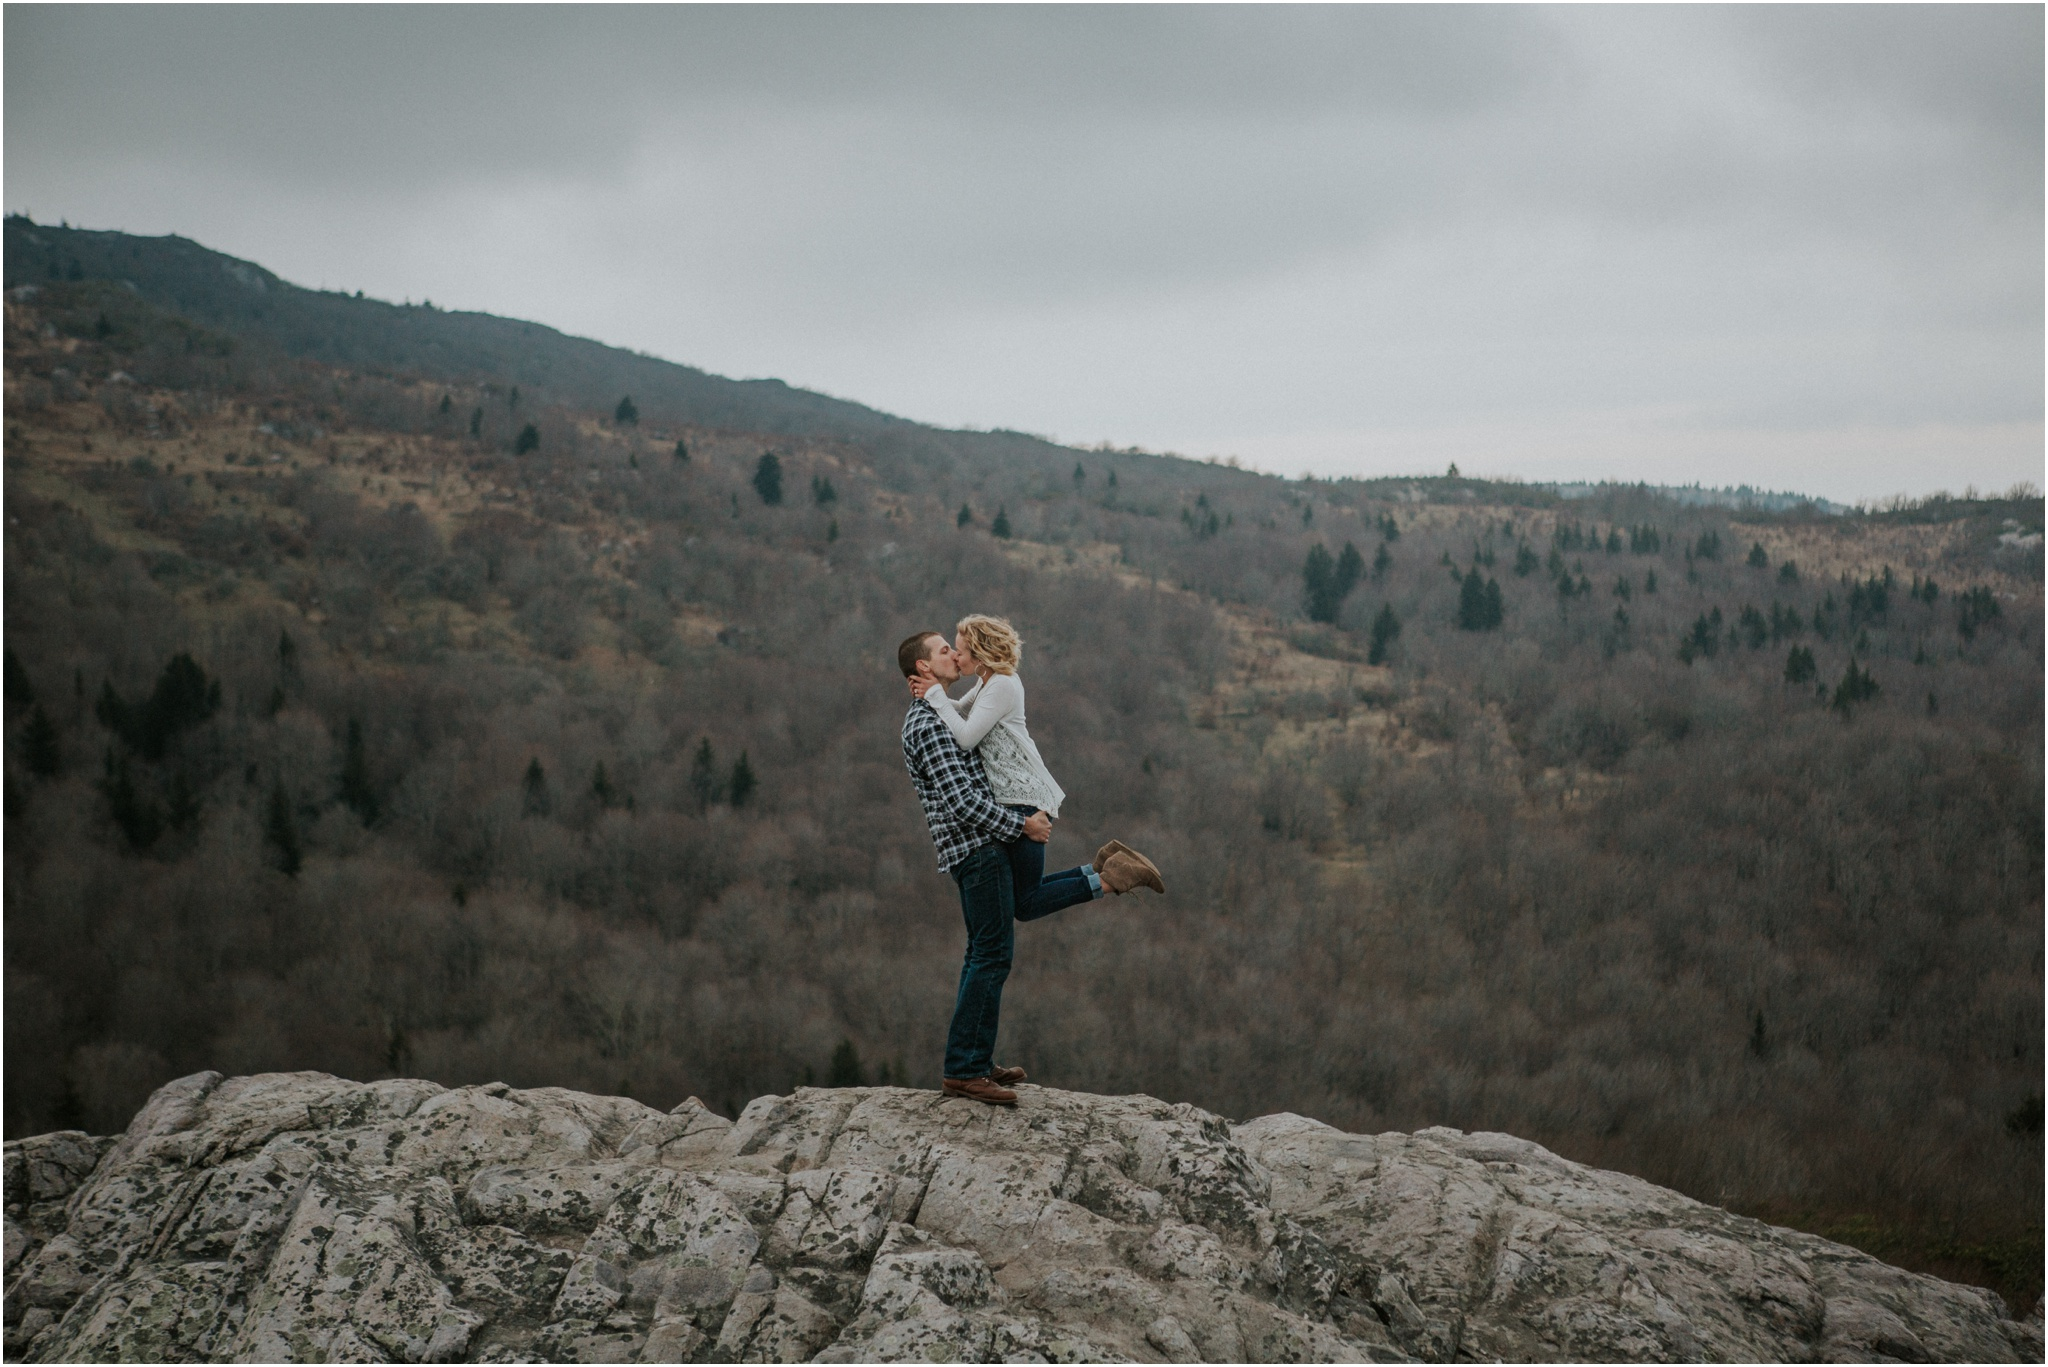 grayson-highlands-engagement-session-foggy-mountain-rustic-appalachian-virginia-katy-sergent-photography_0031.jpg